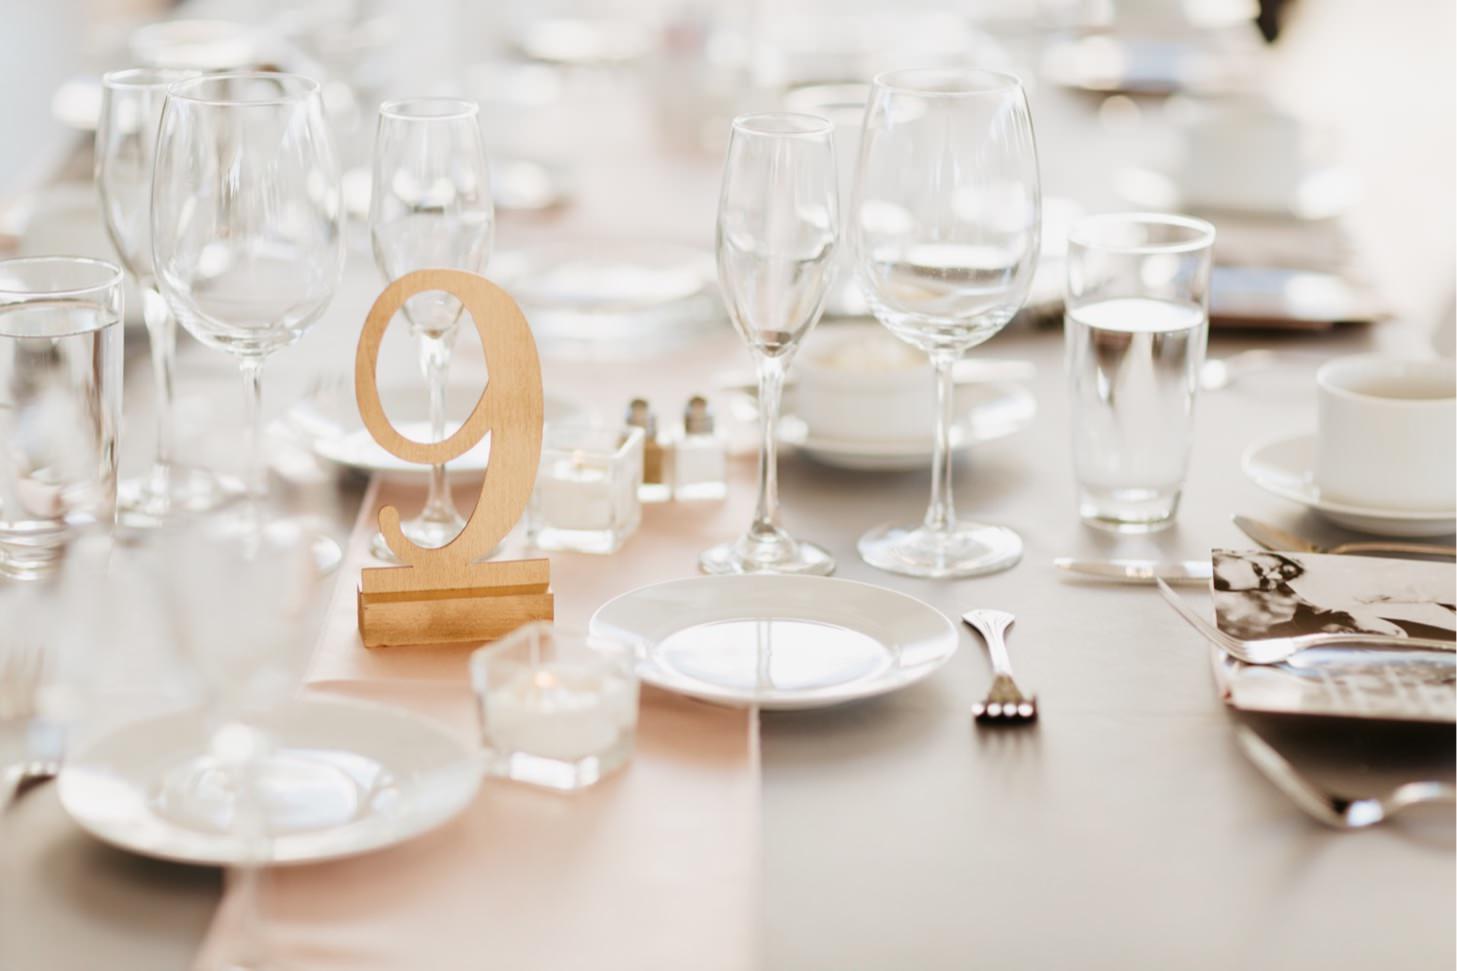 ritz-charles-wedding-reception-downtown-indianapolis-wedding-photographer007.JPG